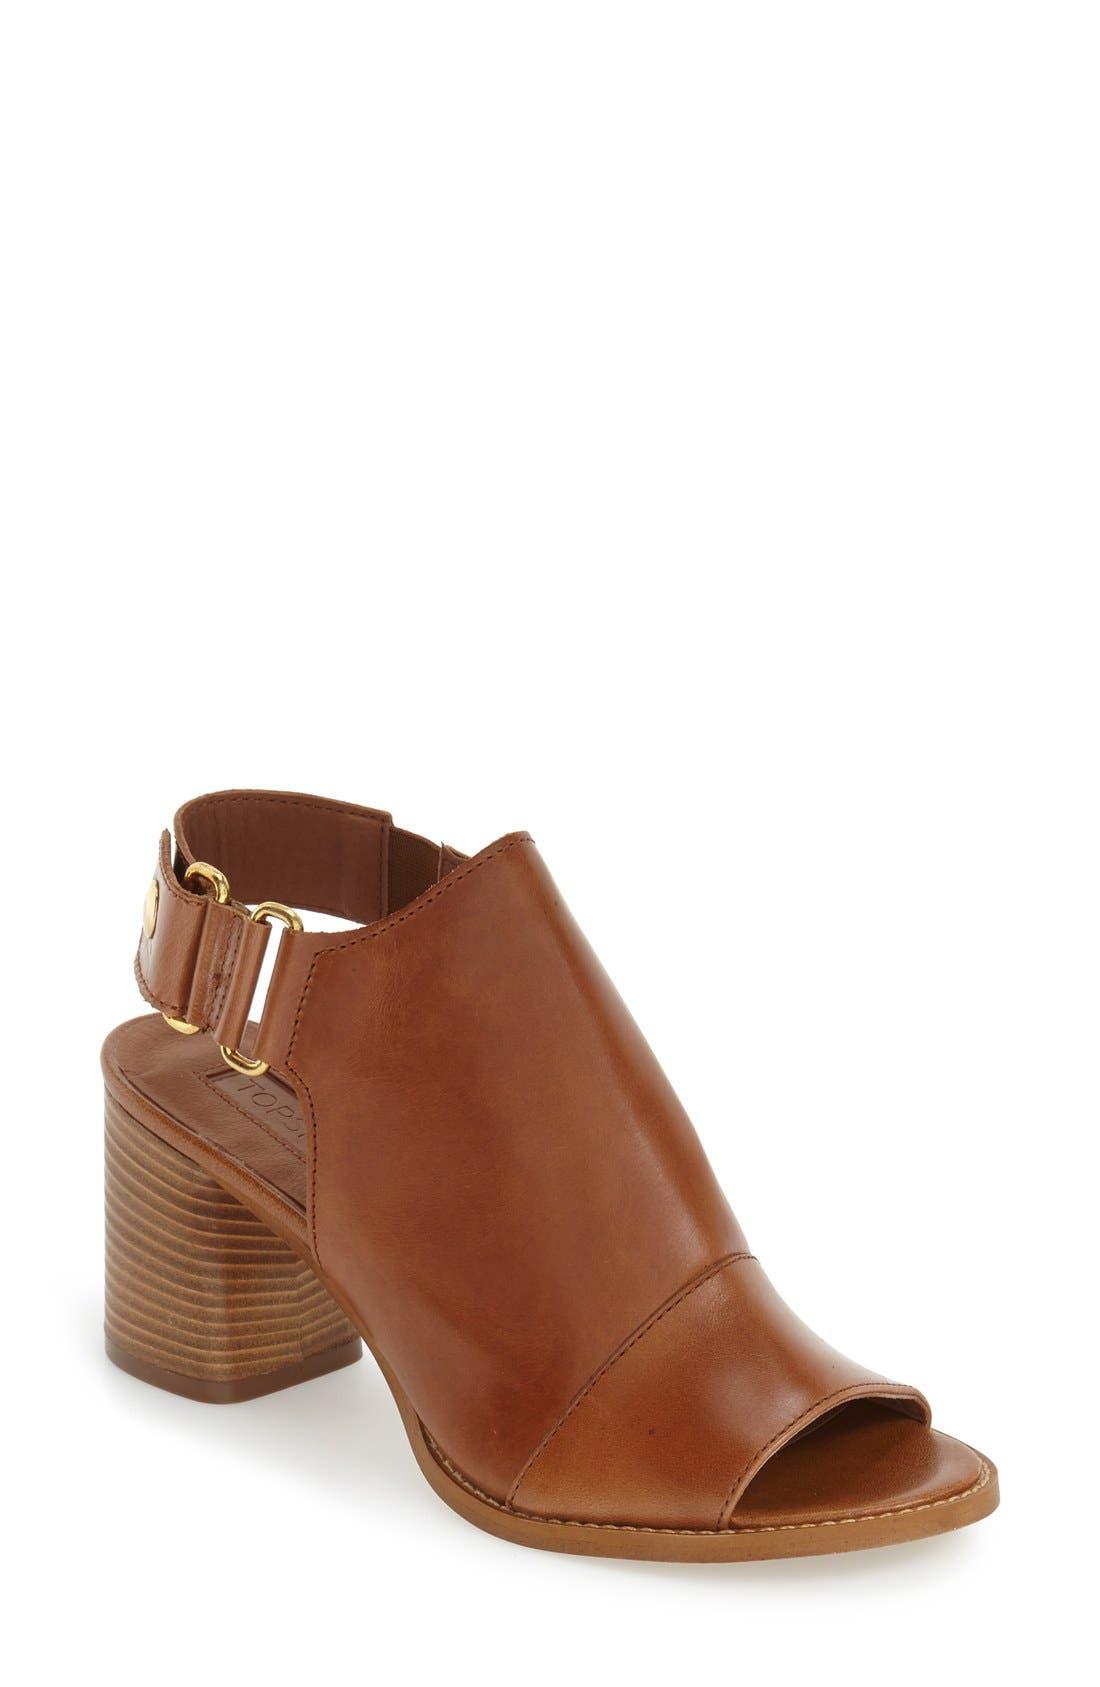 Main Image - Topshop 'Nimi' Slingback Round Heel Sandal (Women)